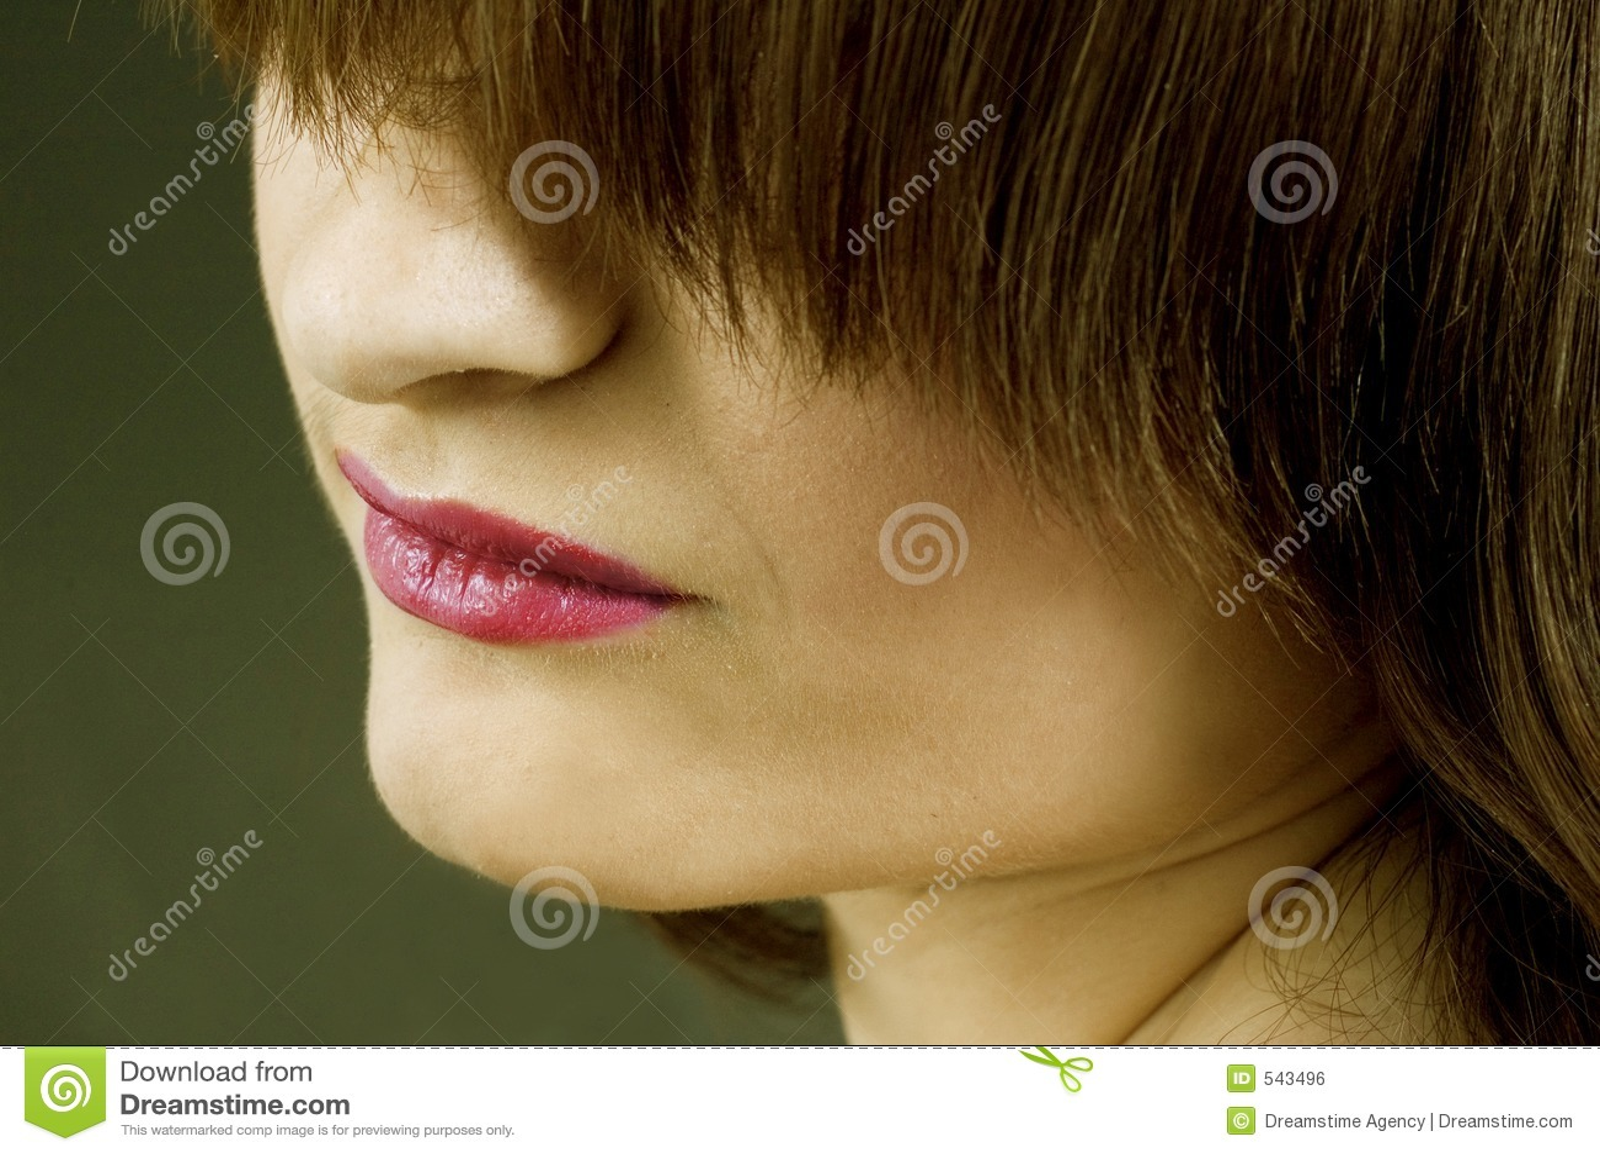 Download 屏蔽 库存照片. 图片 包括有 构成, beautifuler, 红色, 唇膏, 头发, 眼线膏, 鼻子, 乌贼属 - 543496